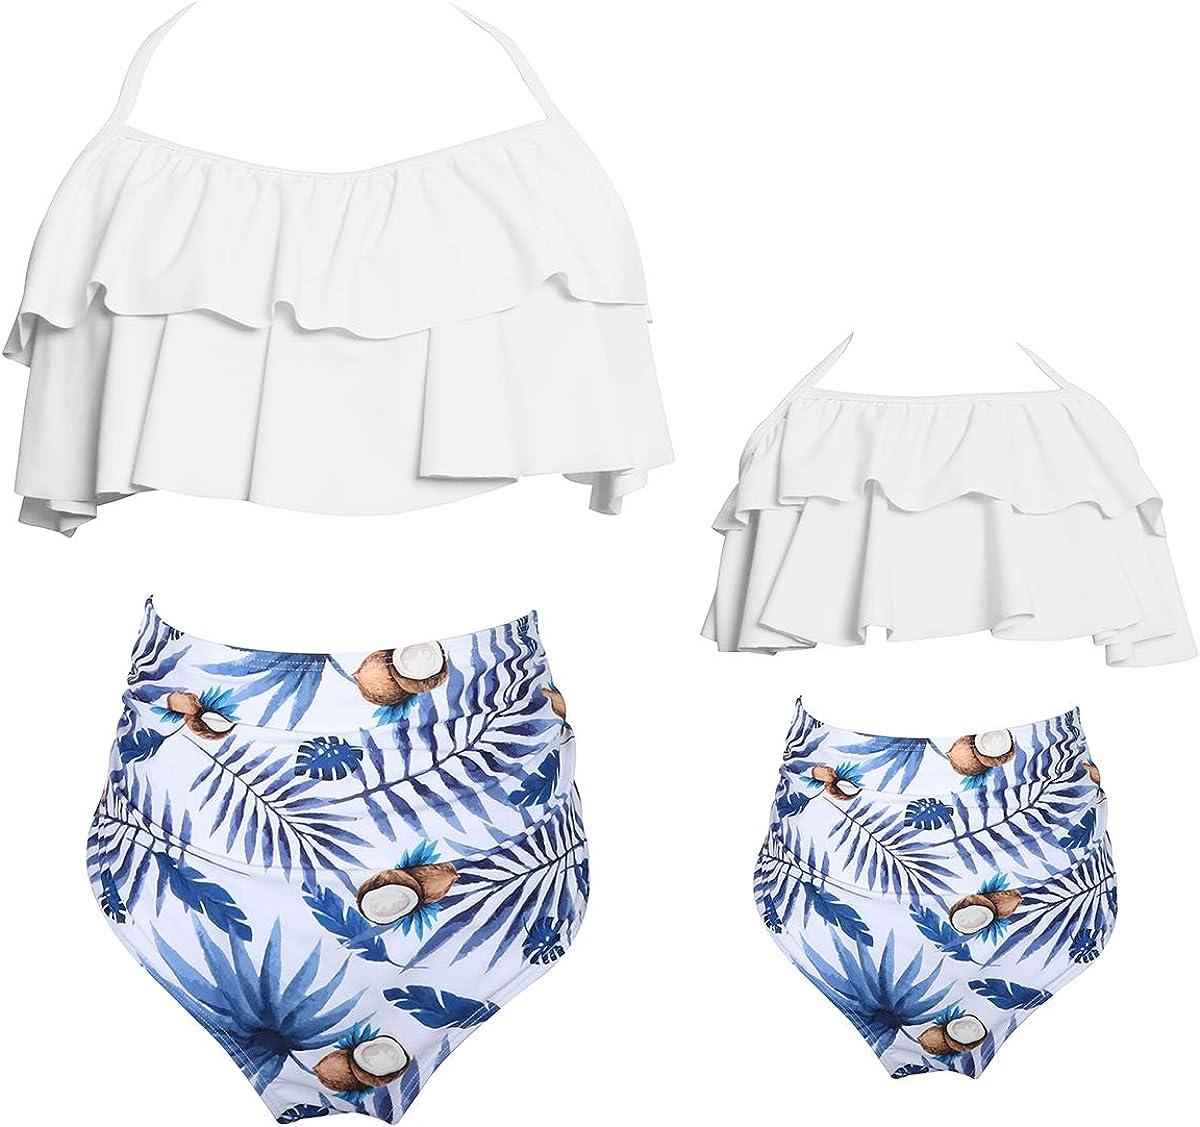 Women Girls Swimming Costume Diverse Style Swimwear Backless Floral Print Off Shoulder Bikini,Parent-Child Swimsuit